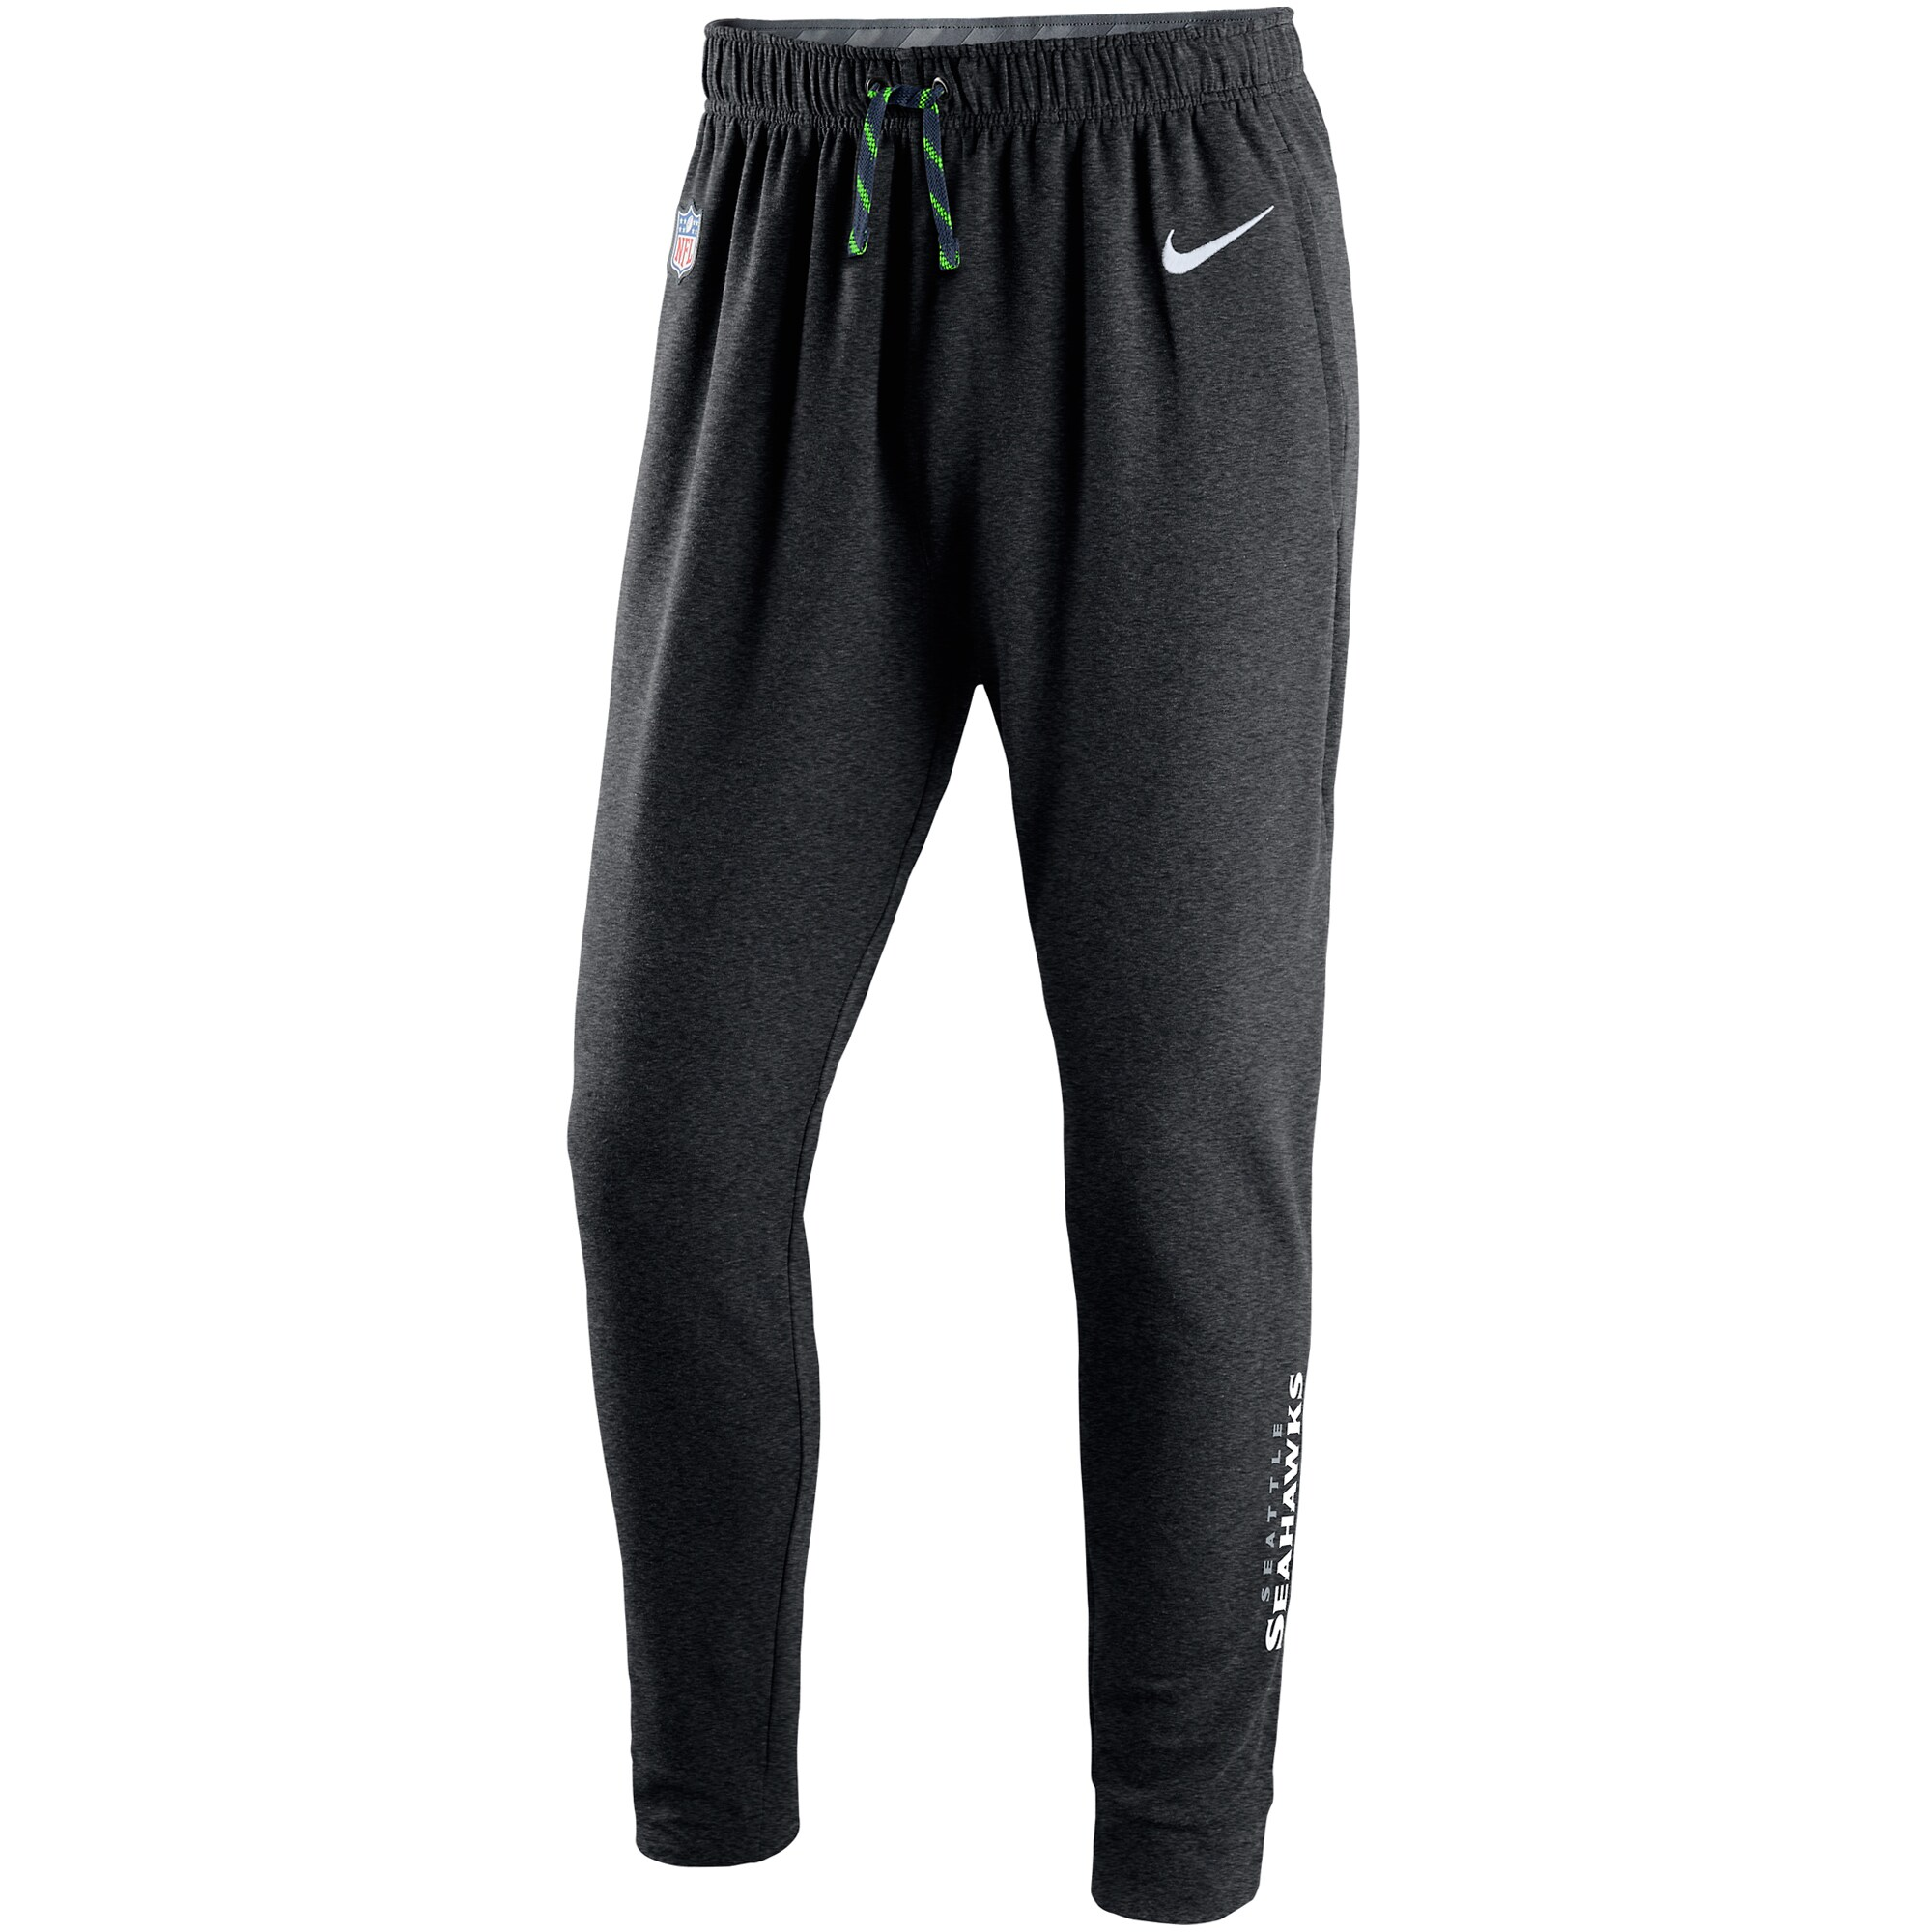 Seattle Seahawks Nike Touch Fleece Performance Pants - Charcoal